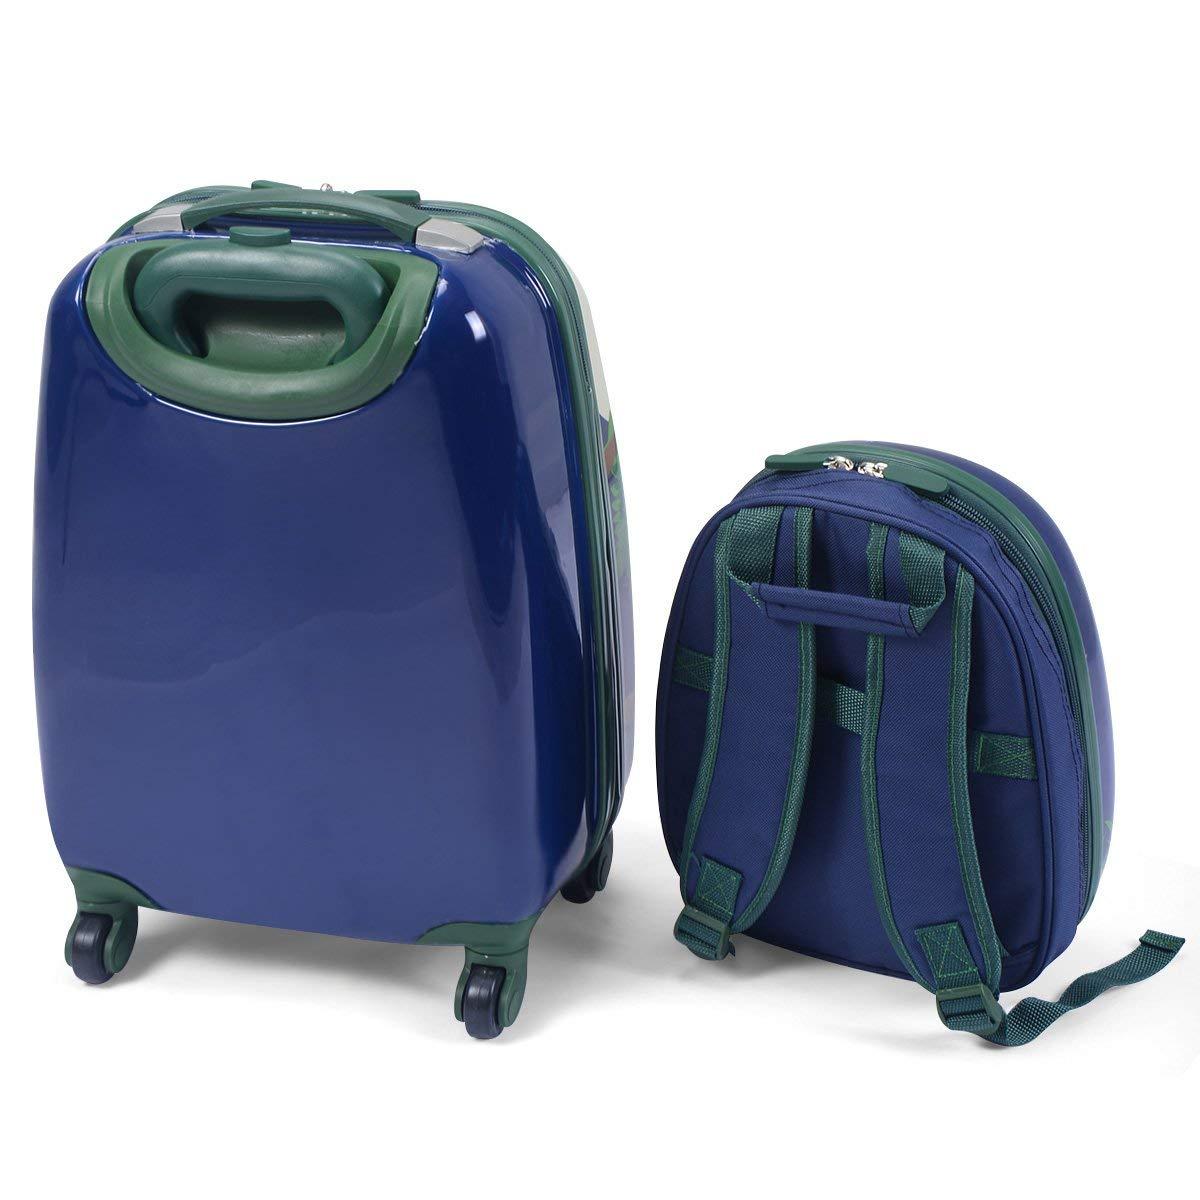 YEXIN 12 16 2PC Enfants Bagages Set Valise Sac /À Dos /École Voyage Cabine Trolley ABS